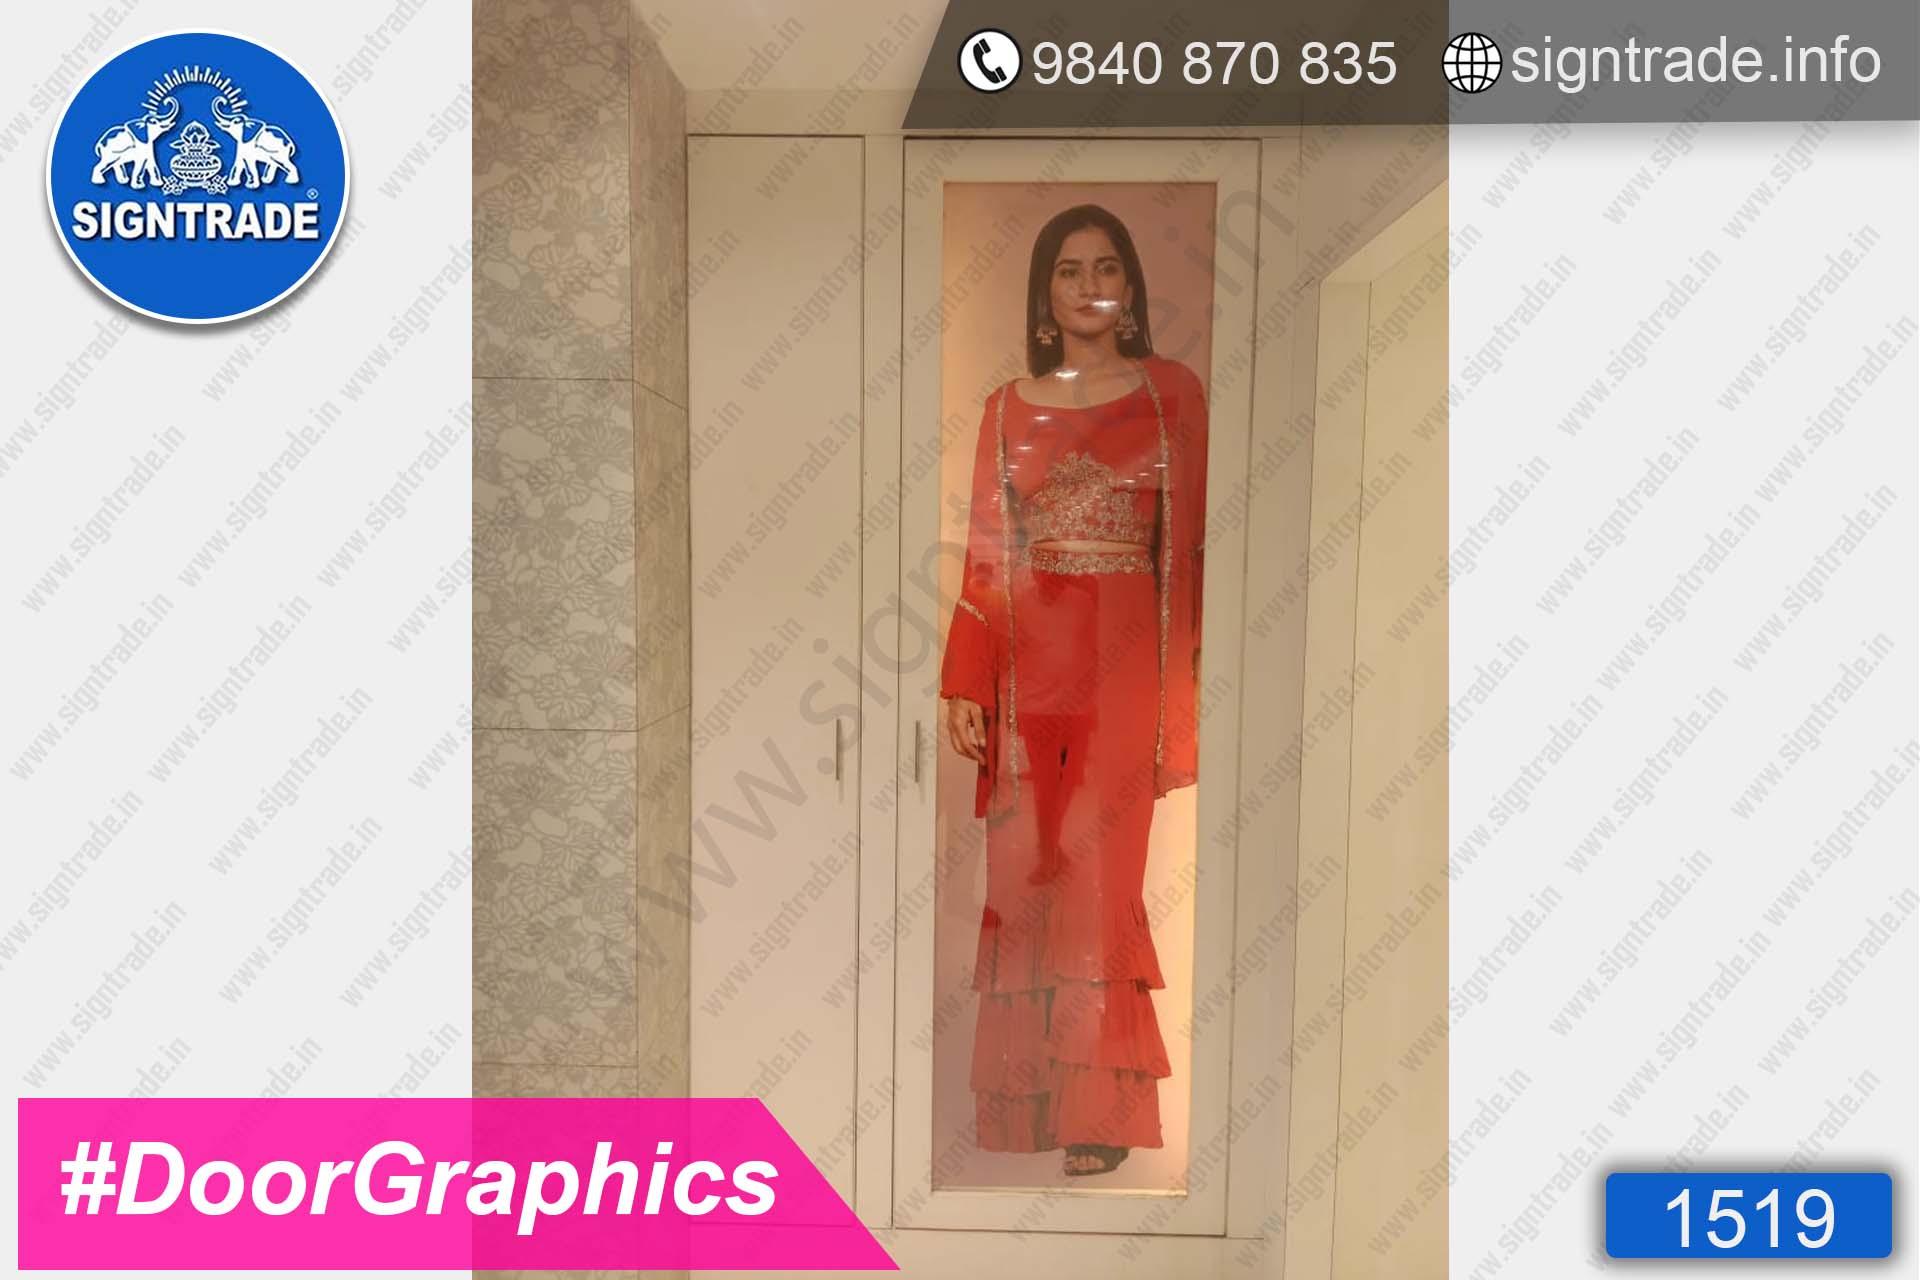 Kay The Fashion Bay, Mount Road, Chennai - SIGNTRADE - Door Graphics, Vinyl Graphics, Vinyl Printing Service in Chennai